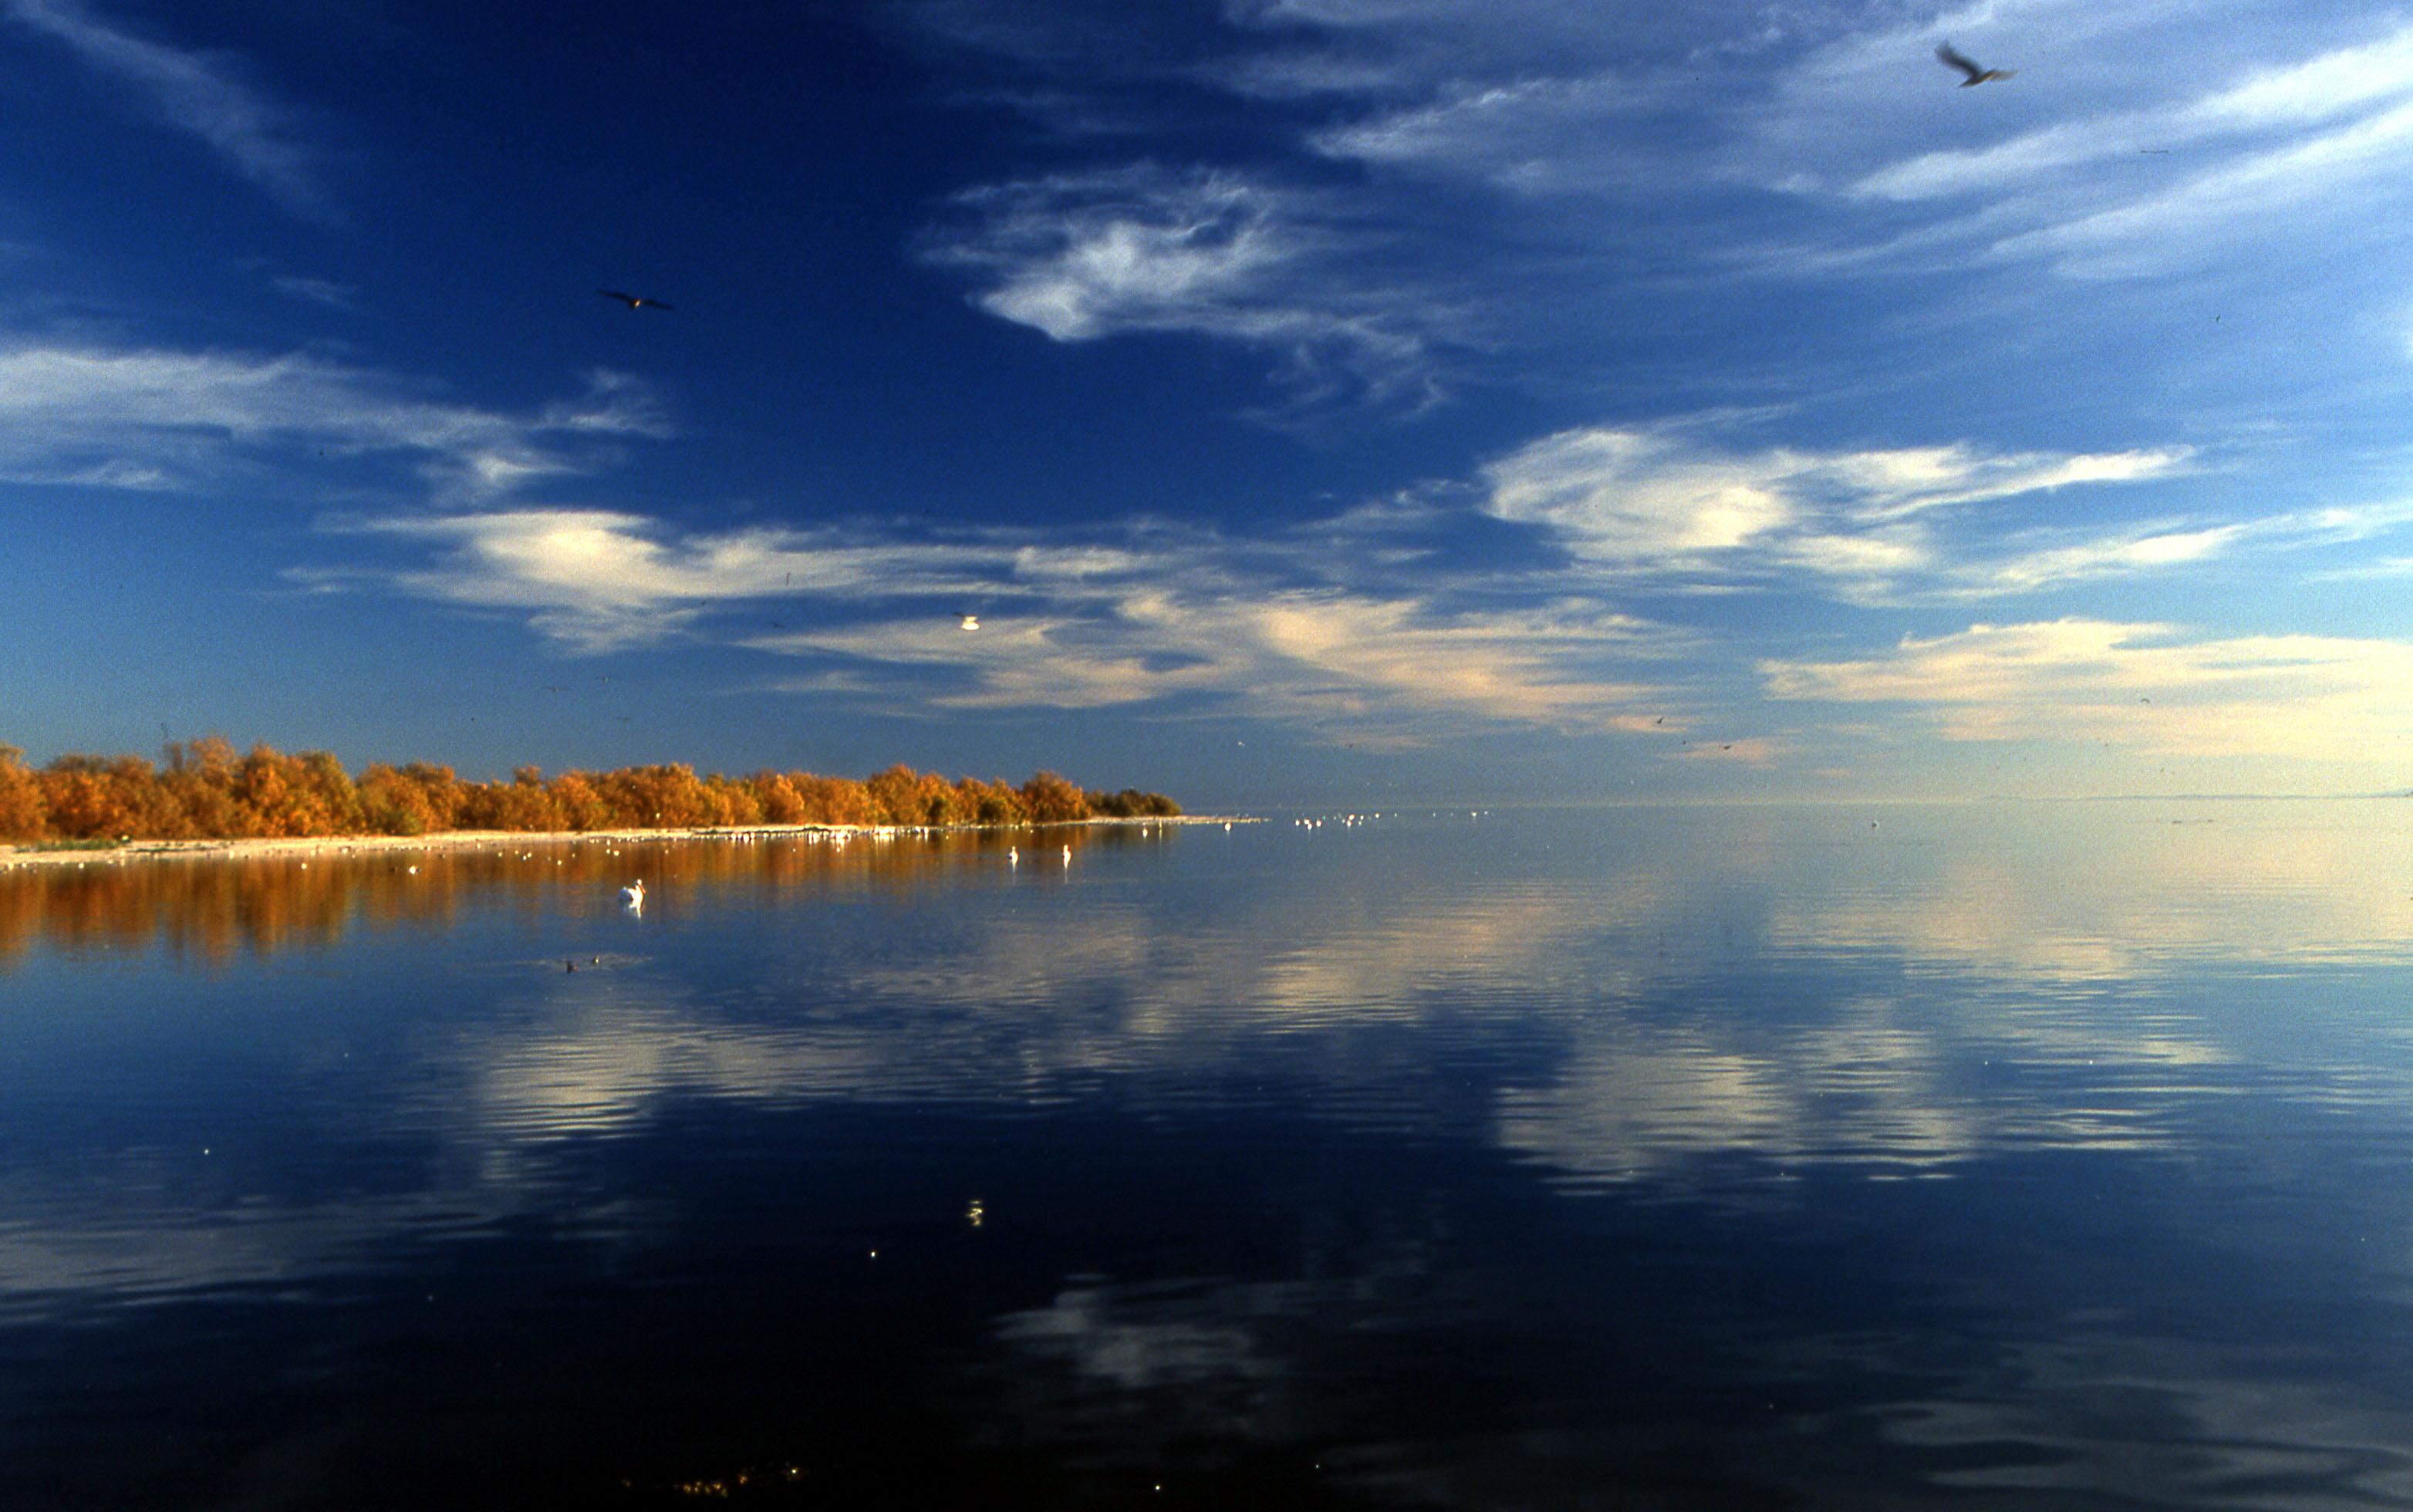 the accidental creation of the salton sea